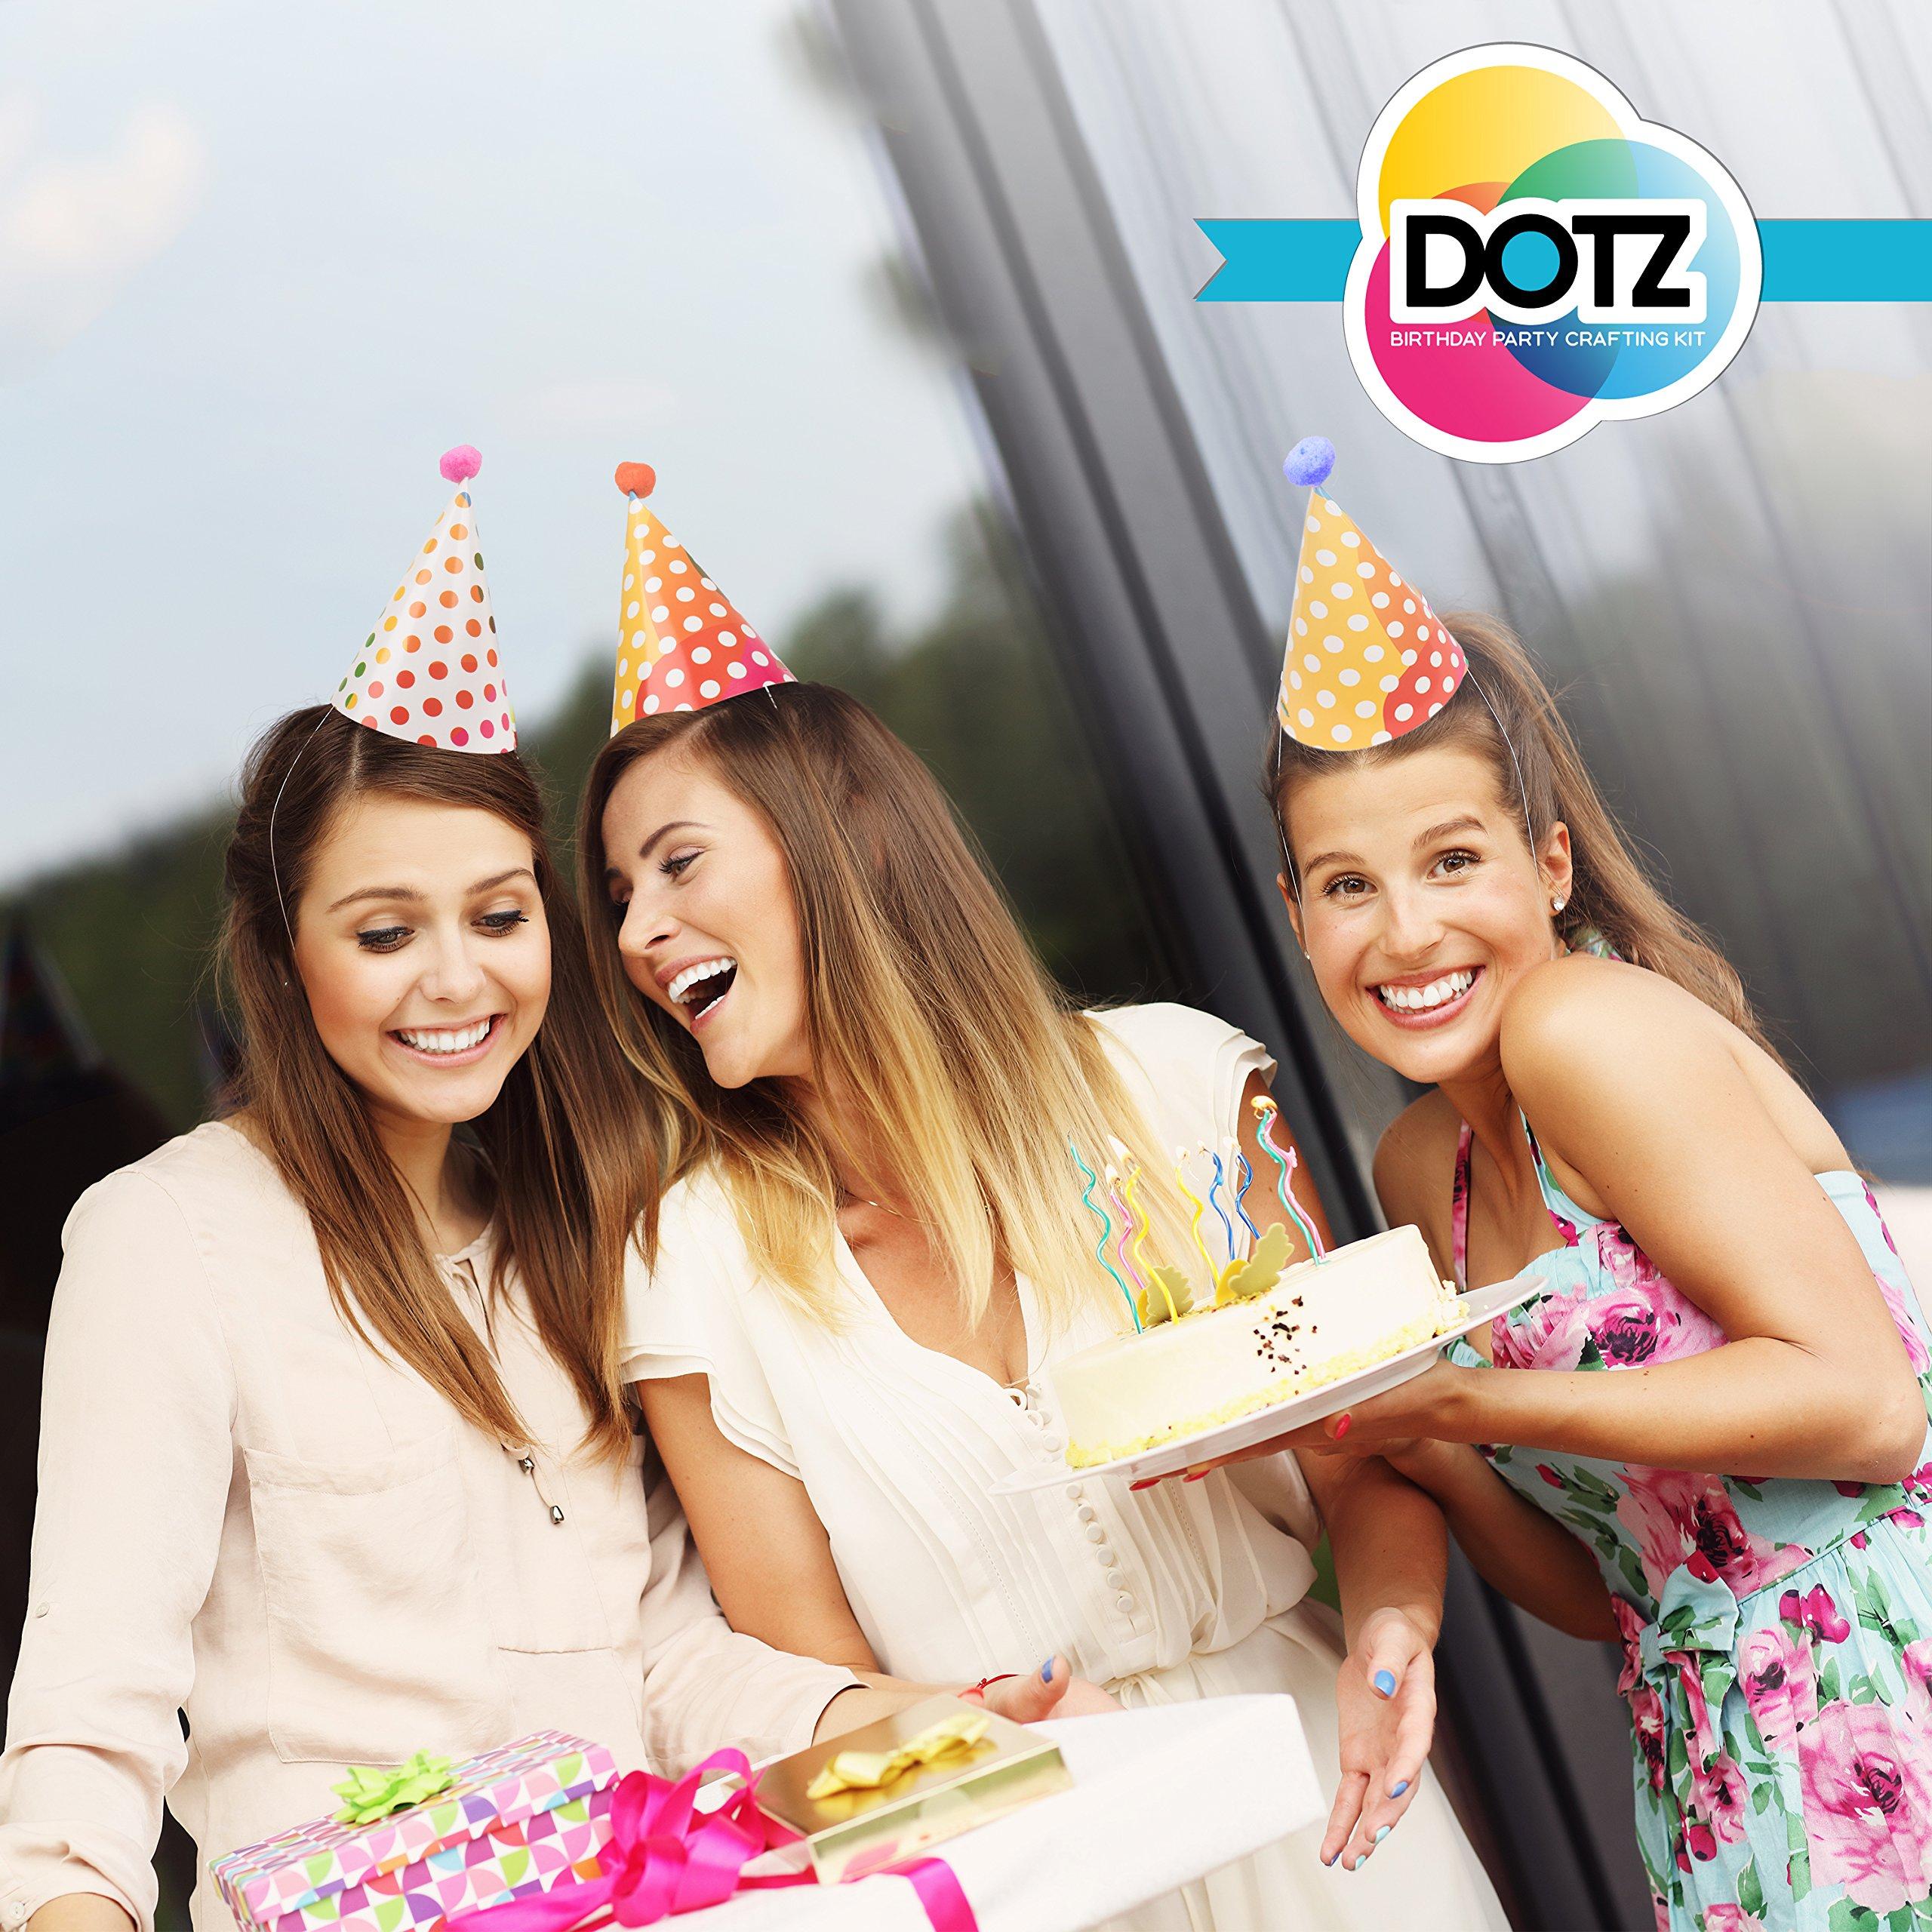 Happy Birthday Party Decorations